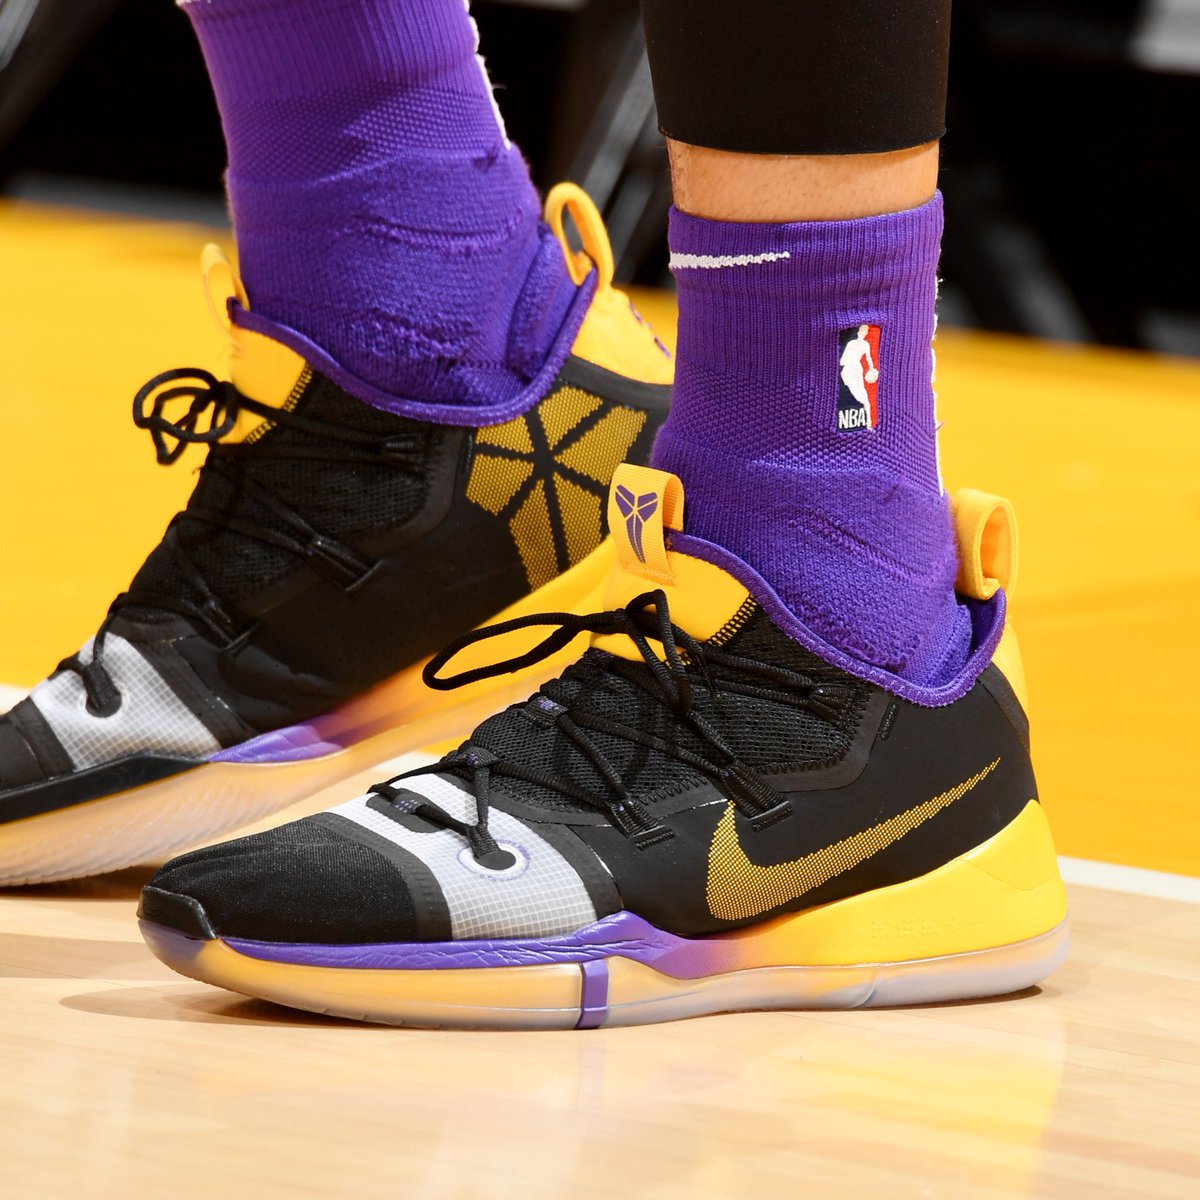 kylekuzma wearing a Nike Kobe A.D. PE